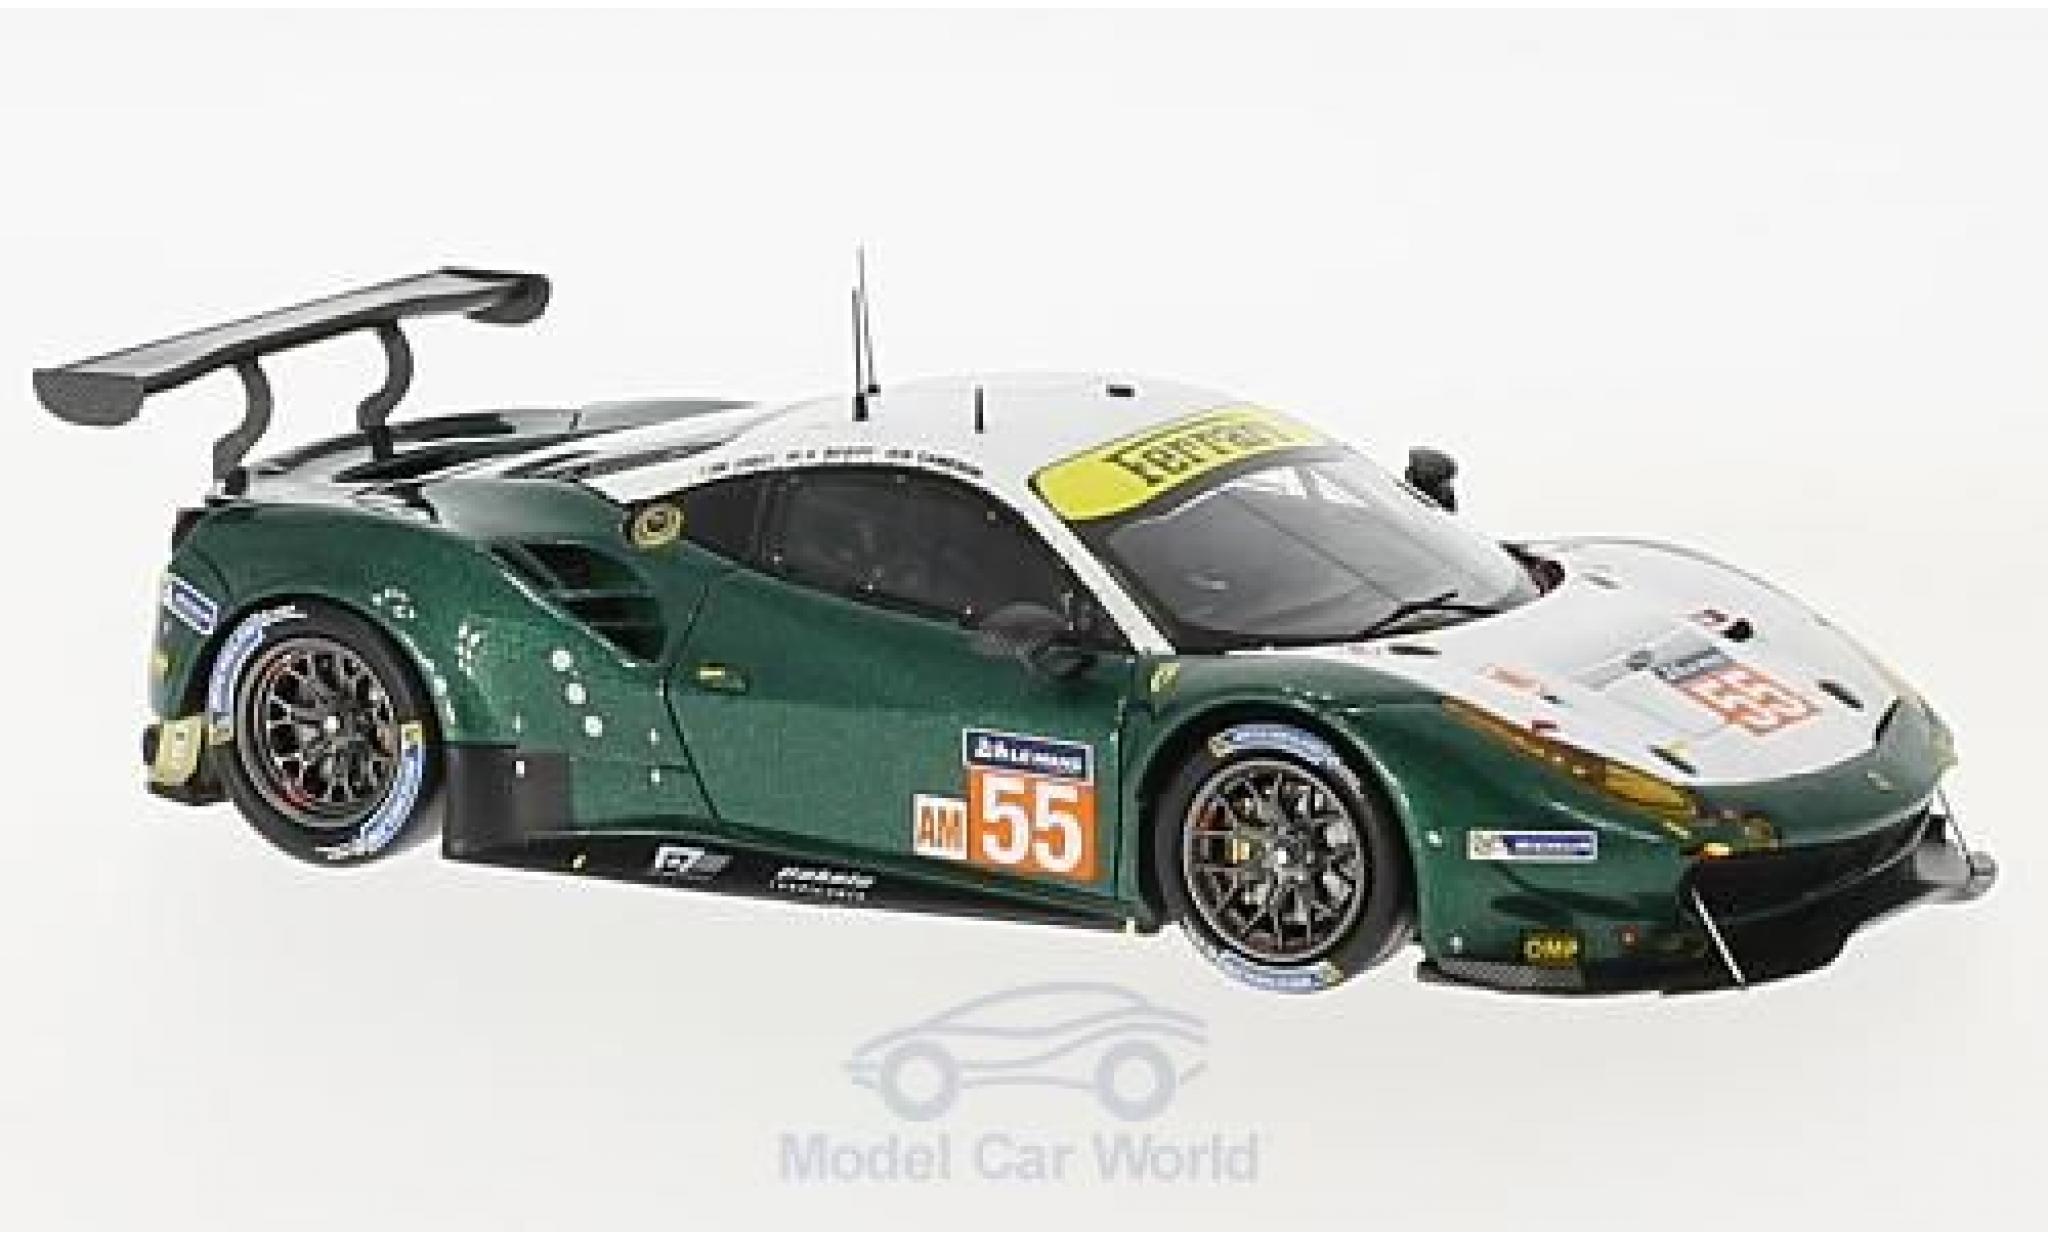 Ferrari 488 1/43 Look Smart GTE No.55 Spirit of Race 24h Le Mans 2017 D.Cameron/A.Scott/M.Cioci